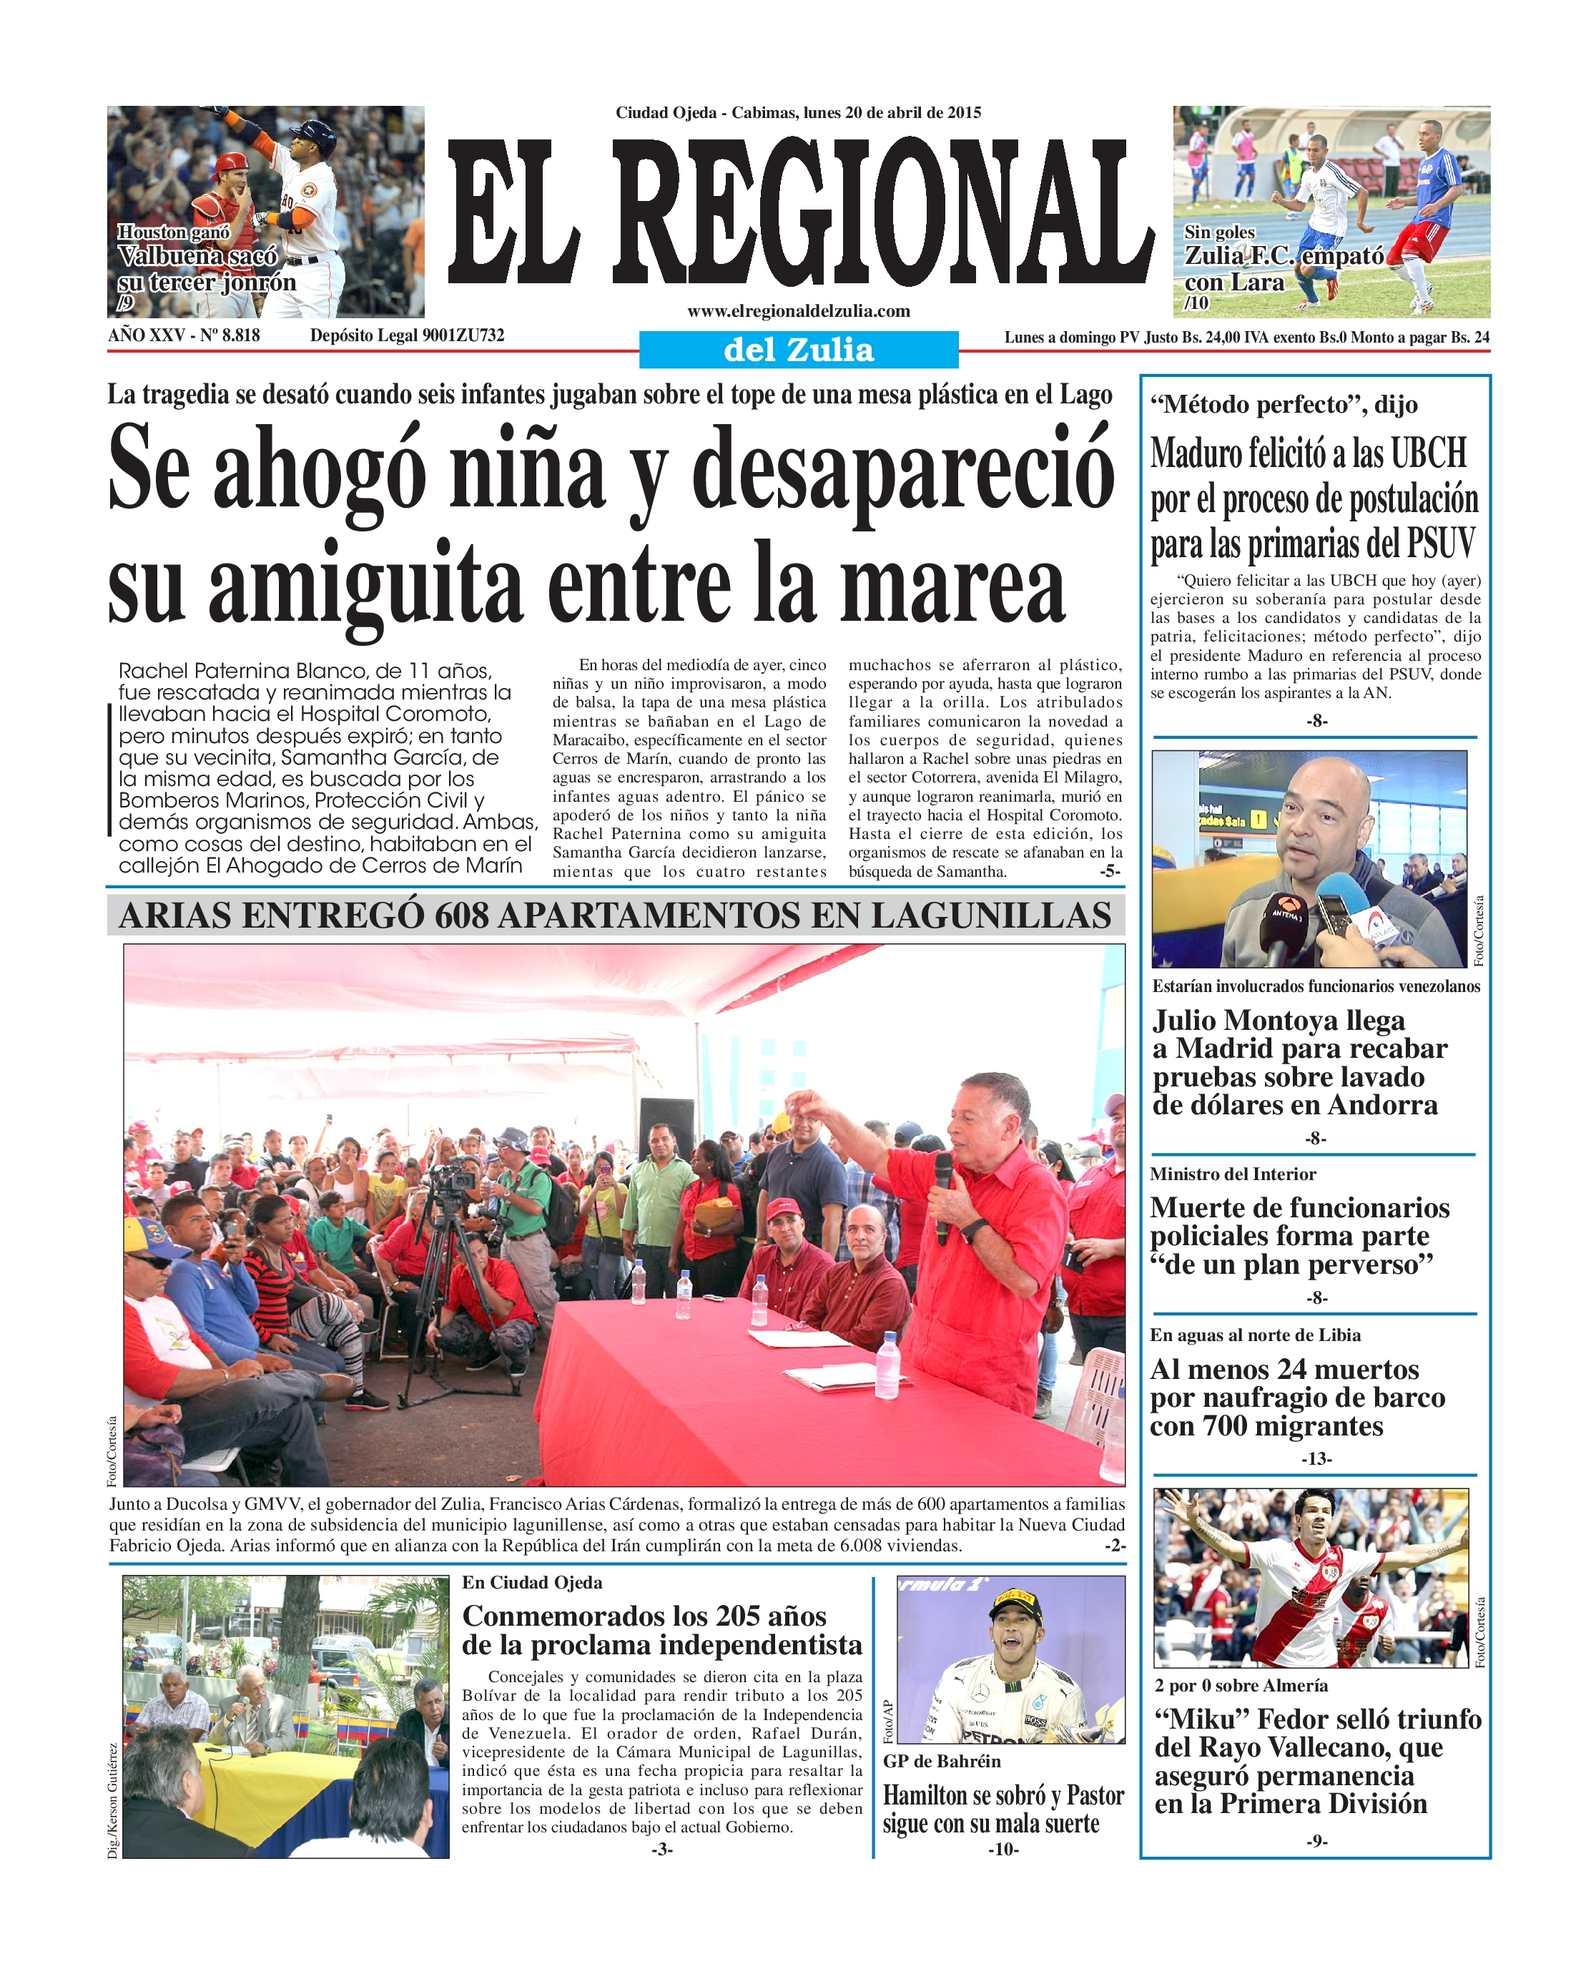 Calaméo - El Regional del Zulia 20-04-2015